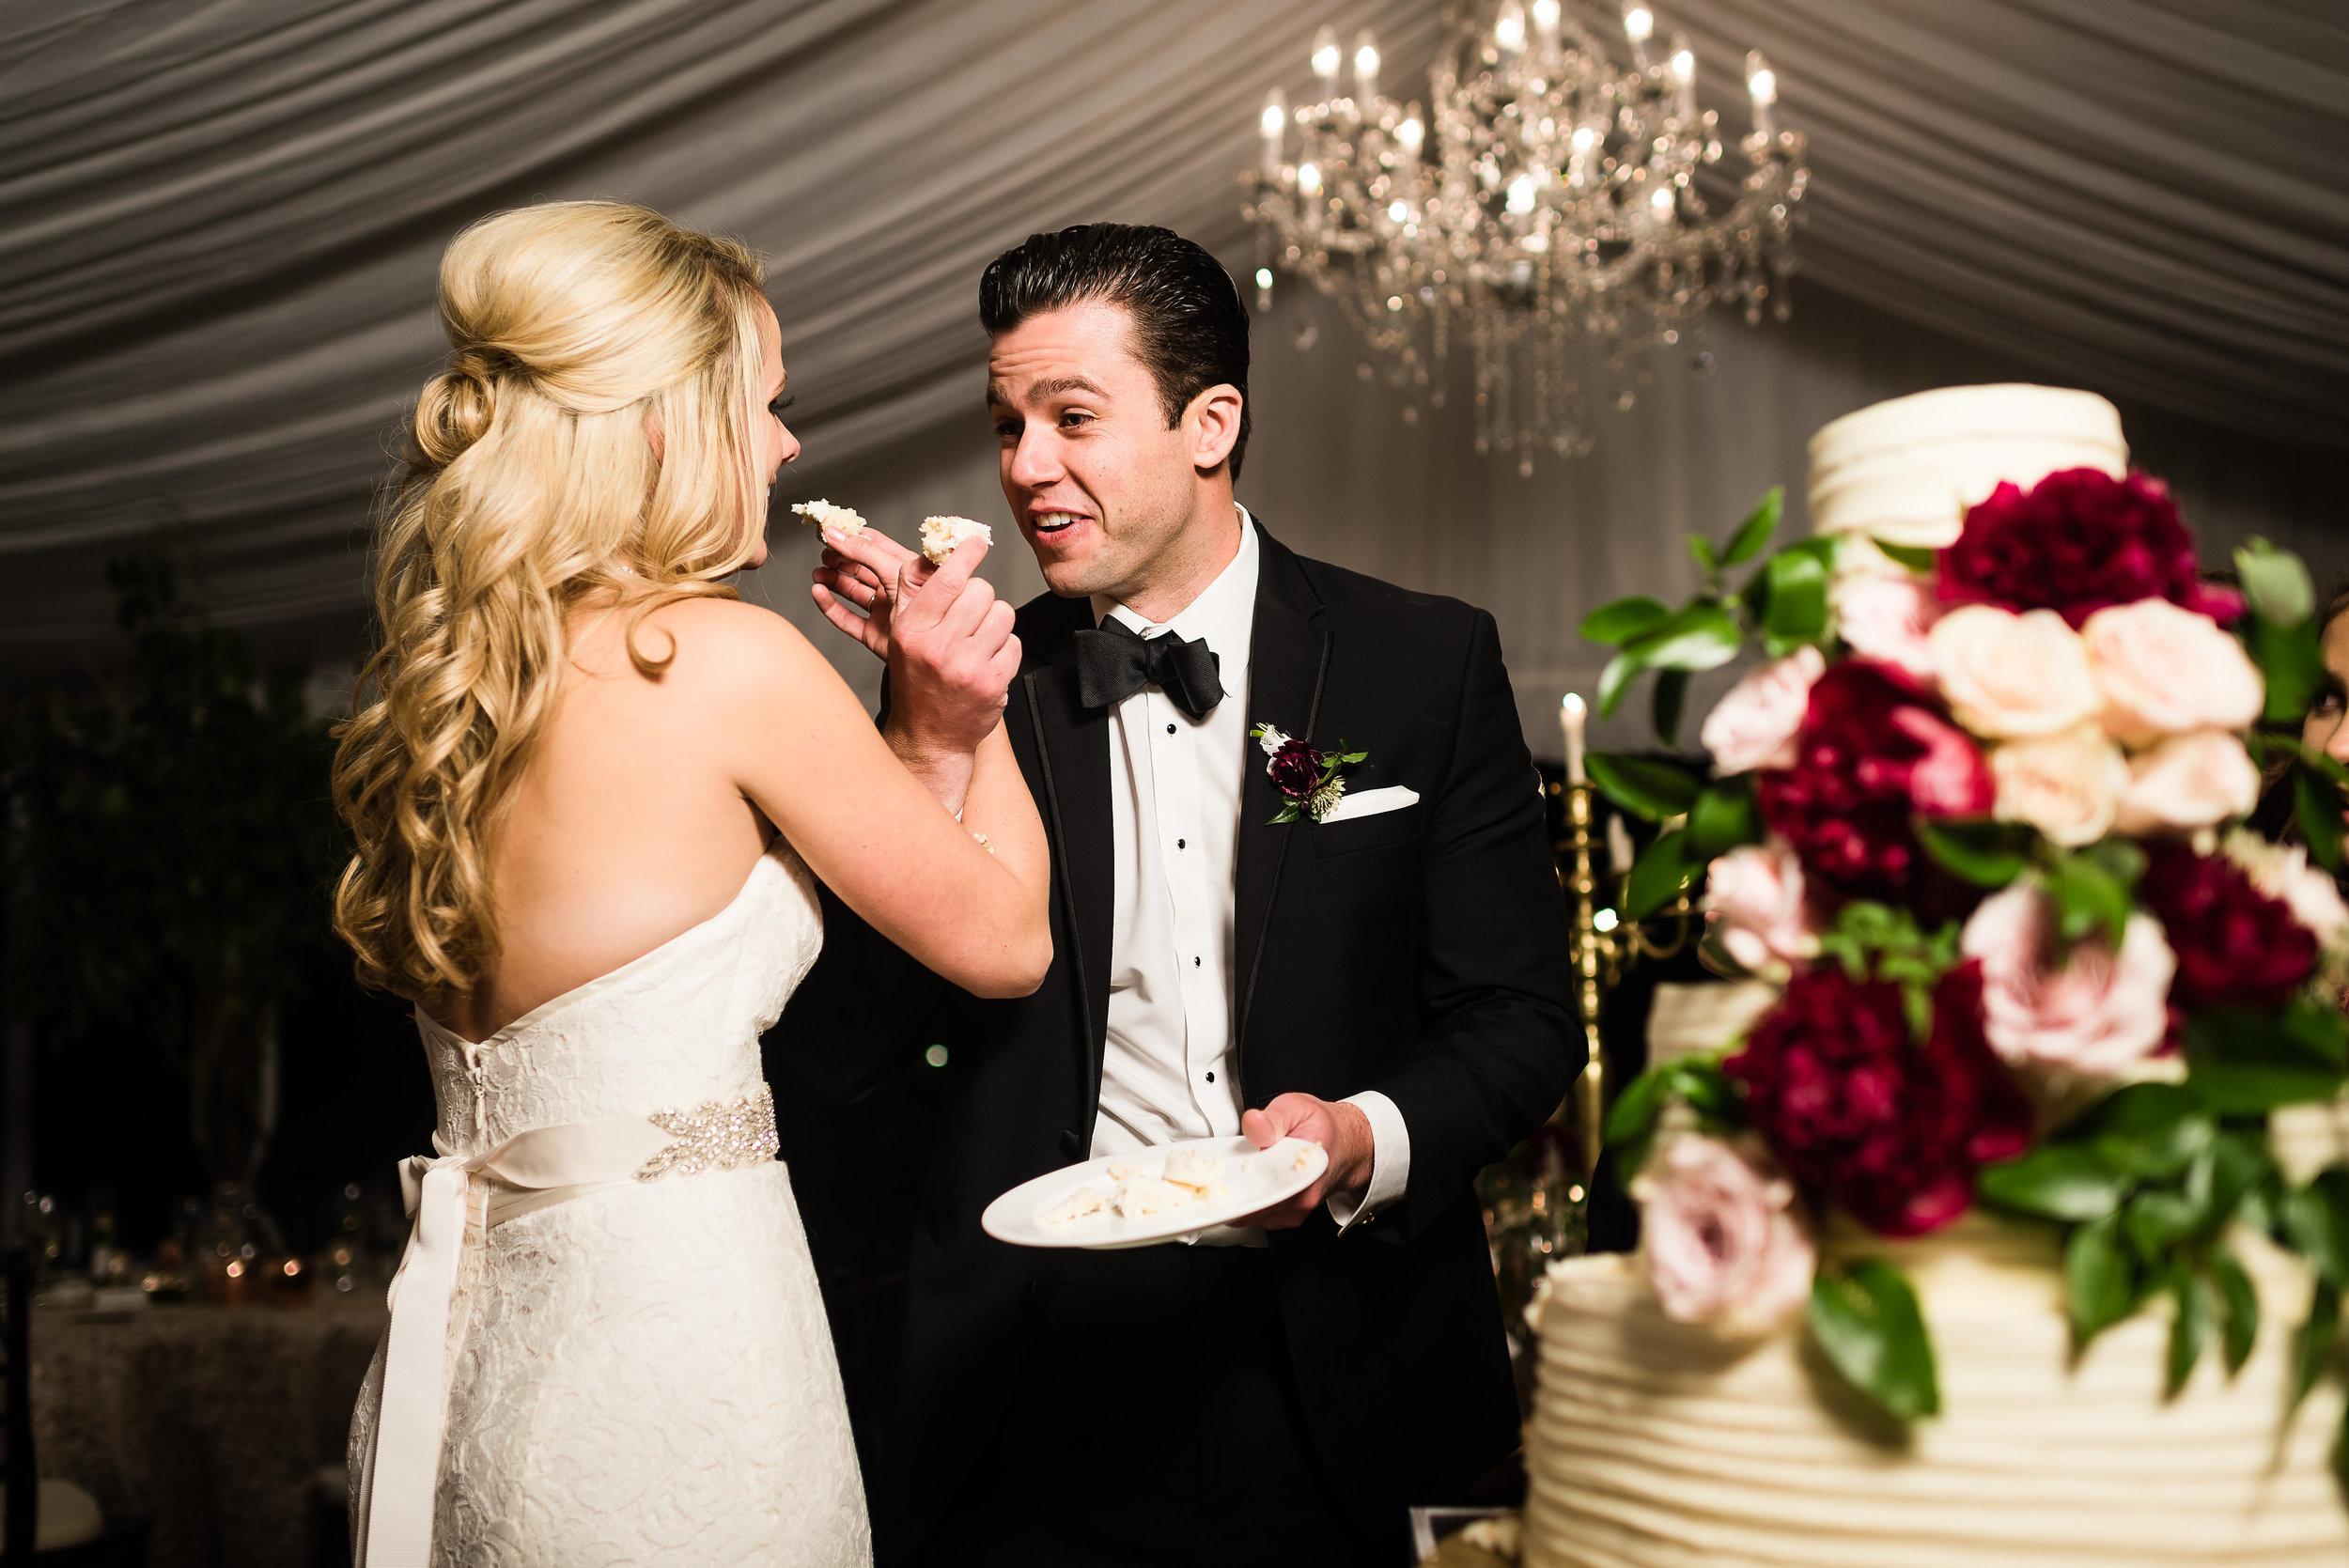 20161022_hawkesdene_fall_wedding_photos_1754.jpg